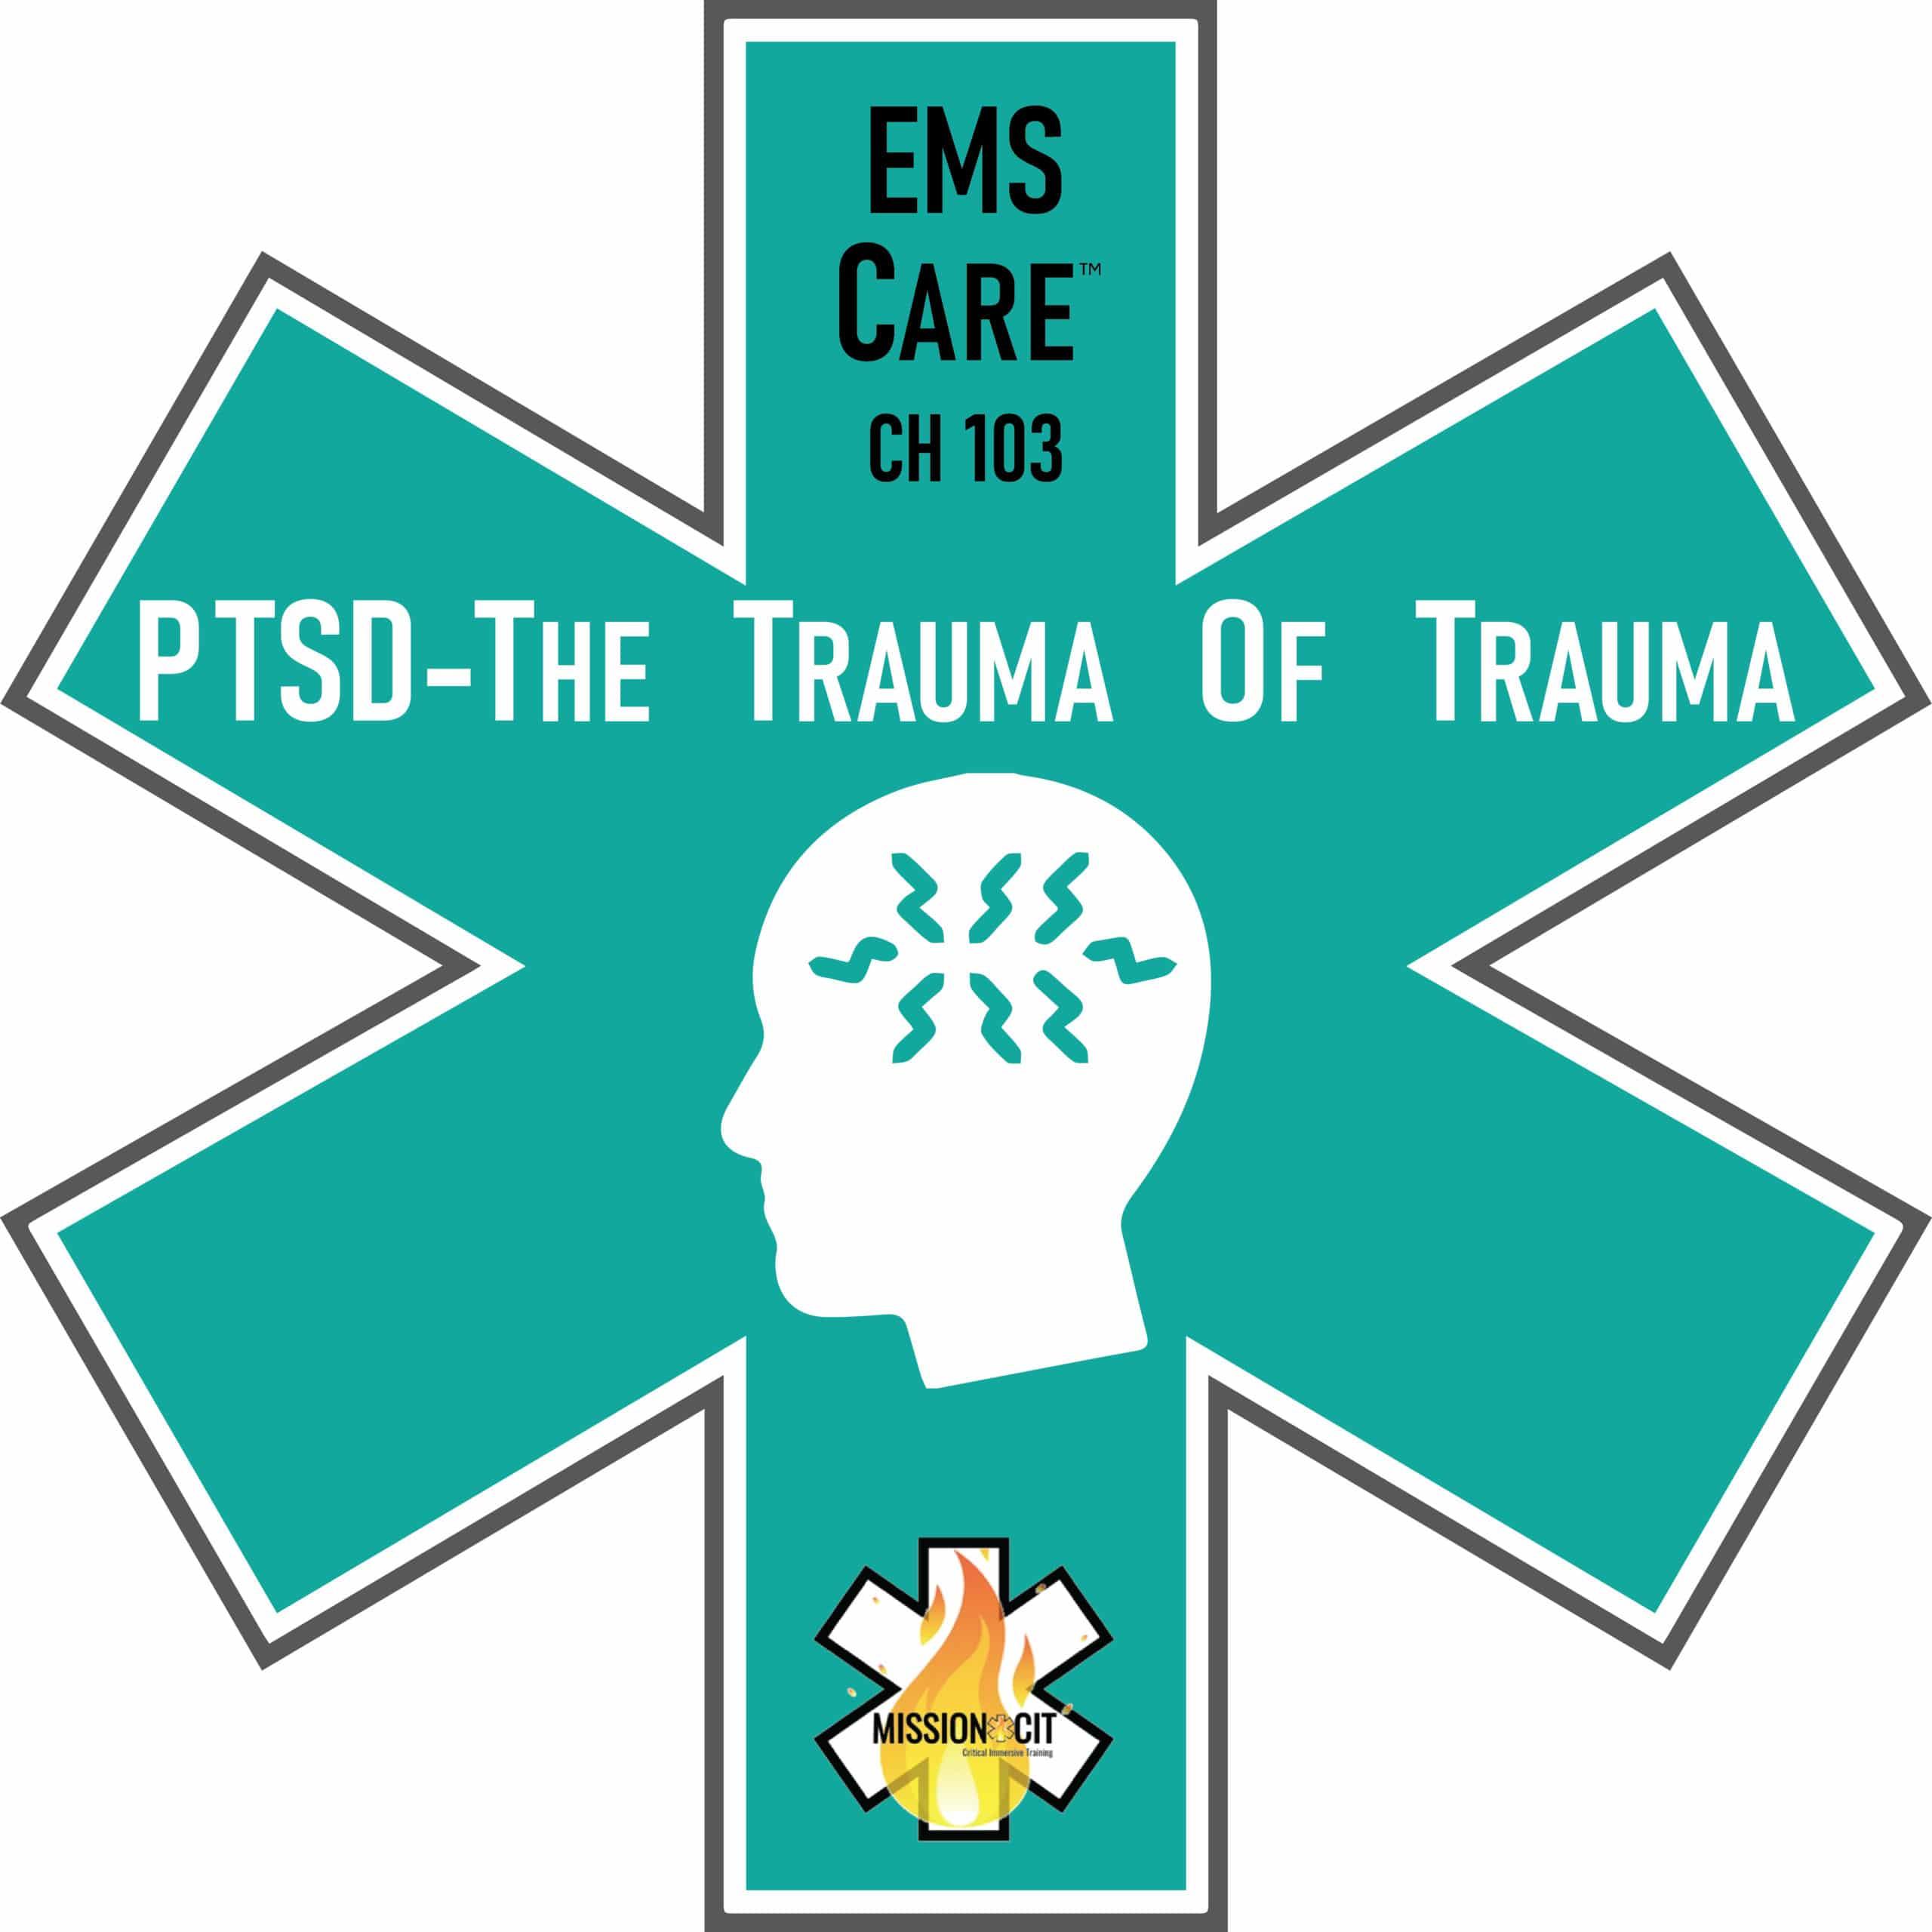 Symptoms of PTSD | PTSD - The Trauma of Trauma | PTSD meaning | PTSD Treatment | PTSD disorder | PTSD causes | EMS PTSD Symptoms